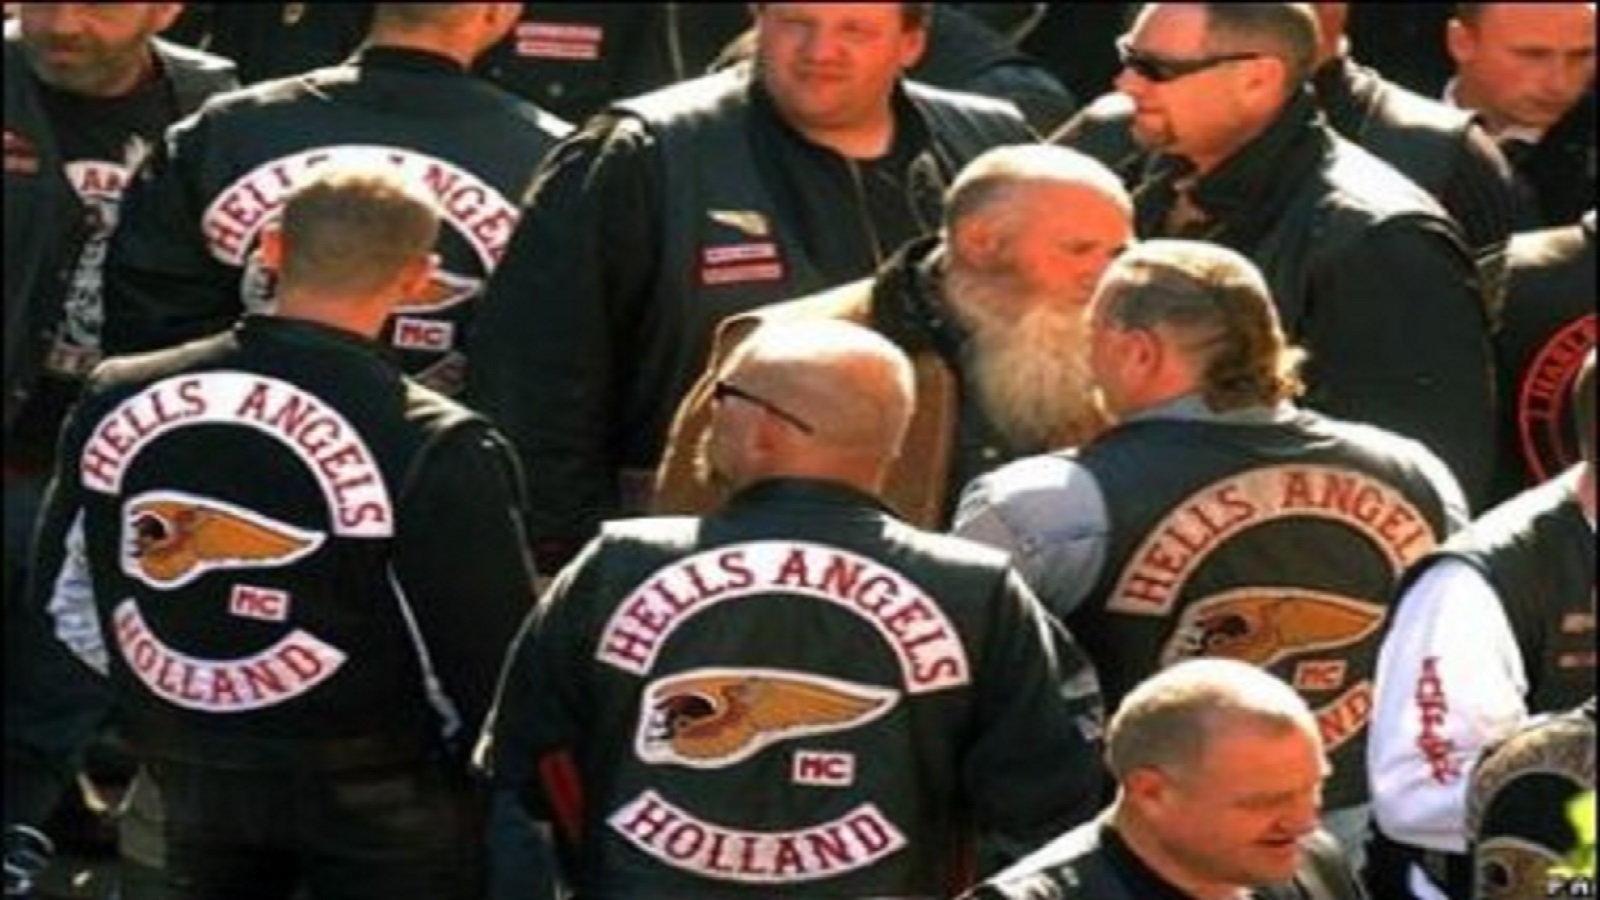 10 Most Notorious Outlaw Biker Gangs | Hdforums